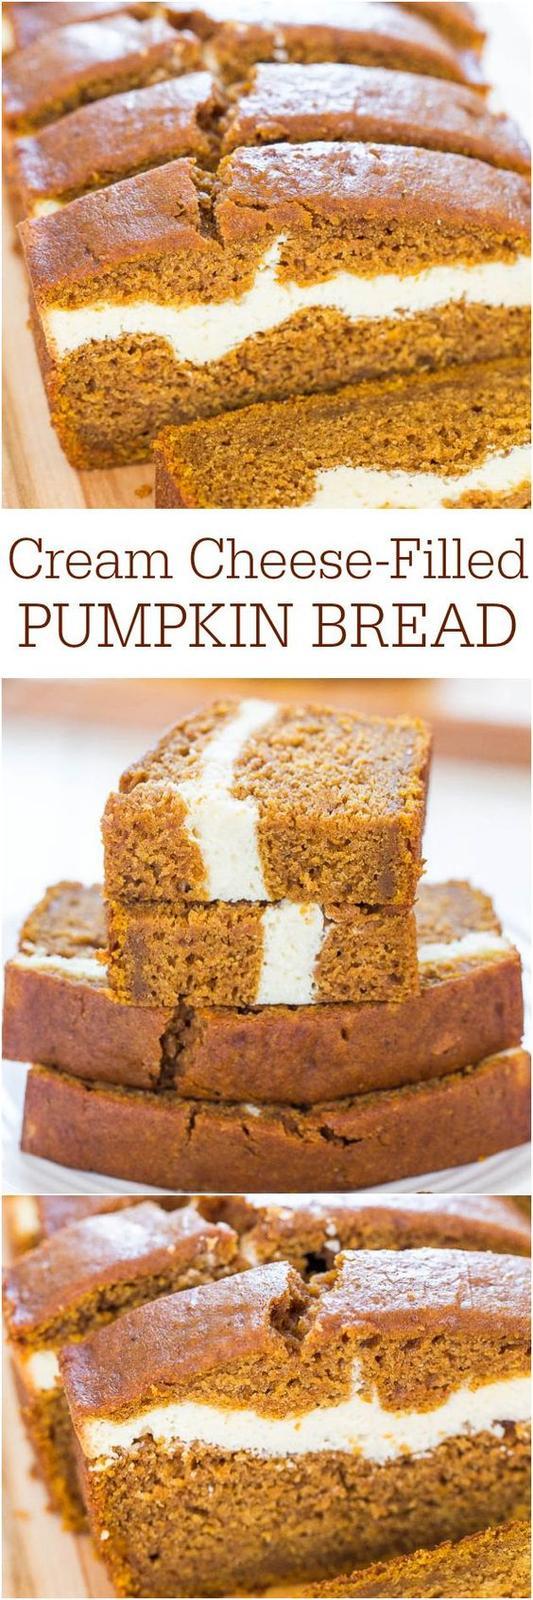 Americké koláčky - Cream Cheese-Filled Pumpkin Bread